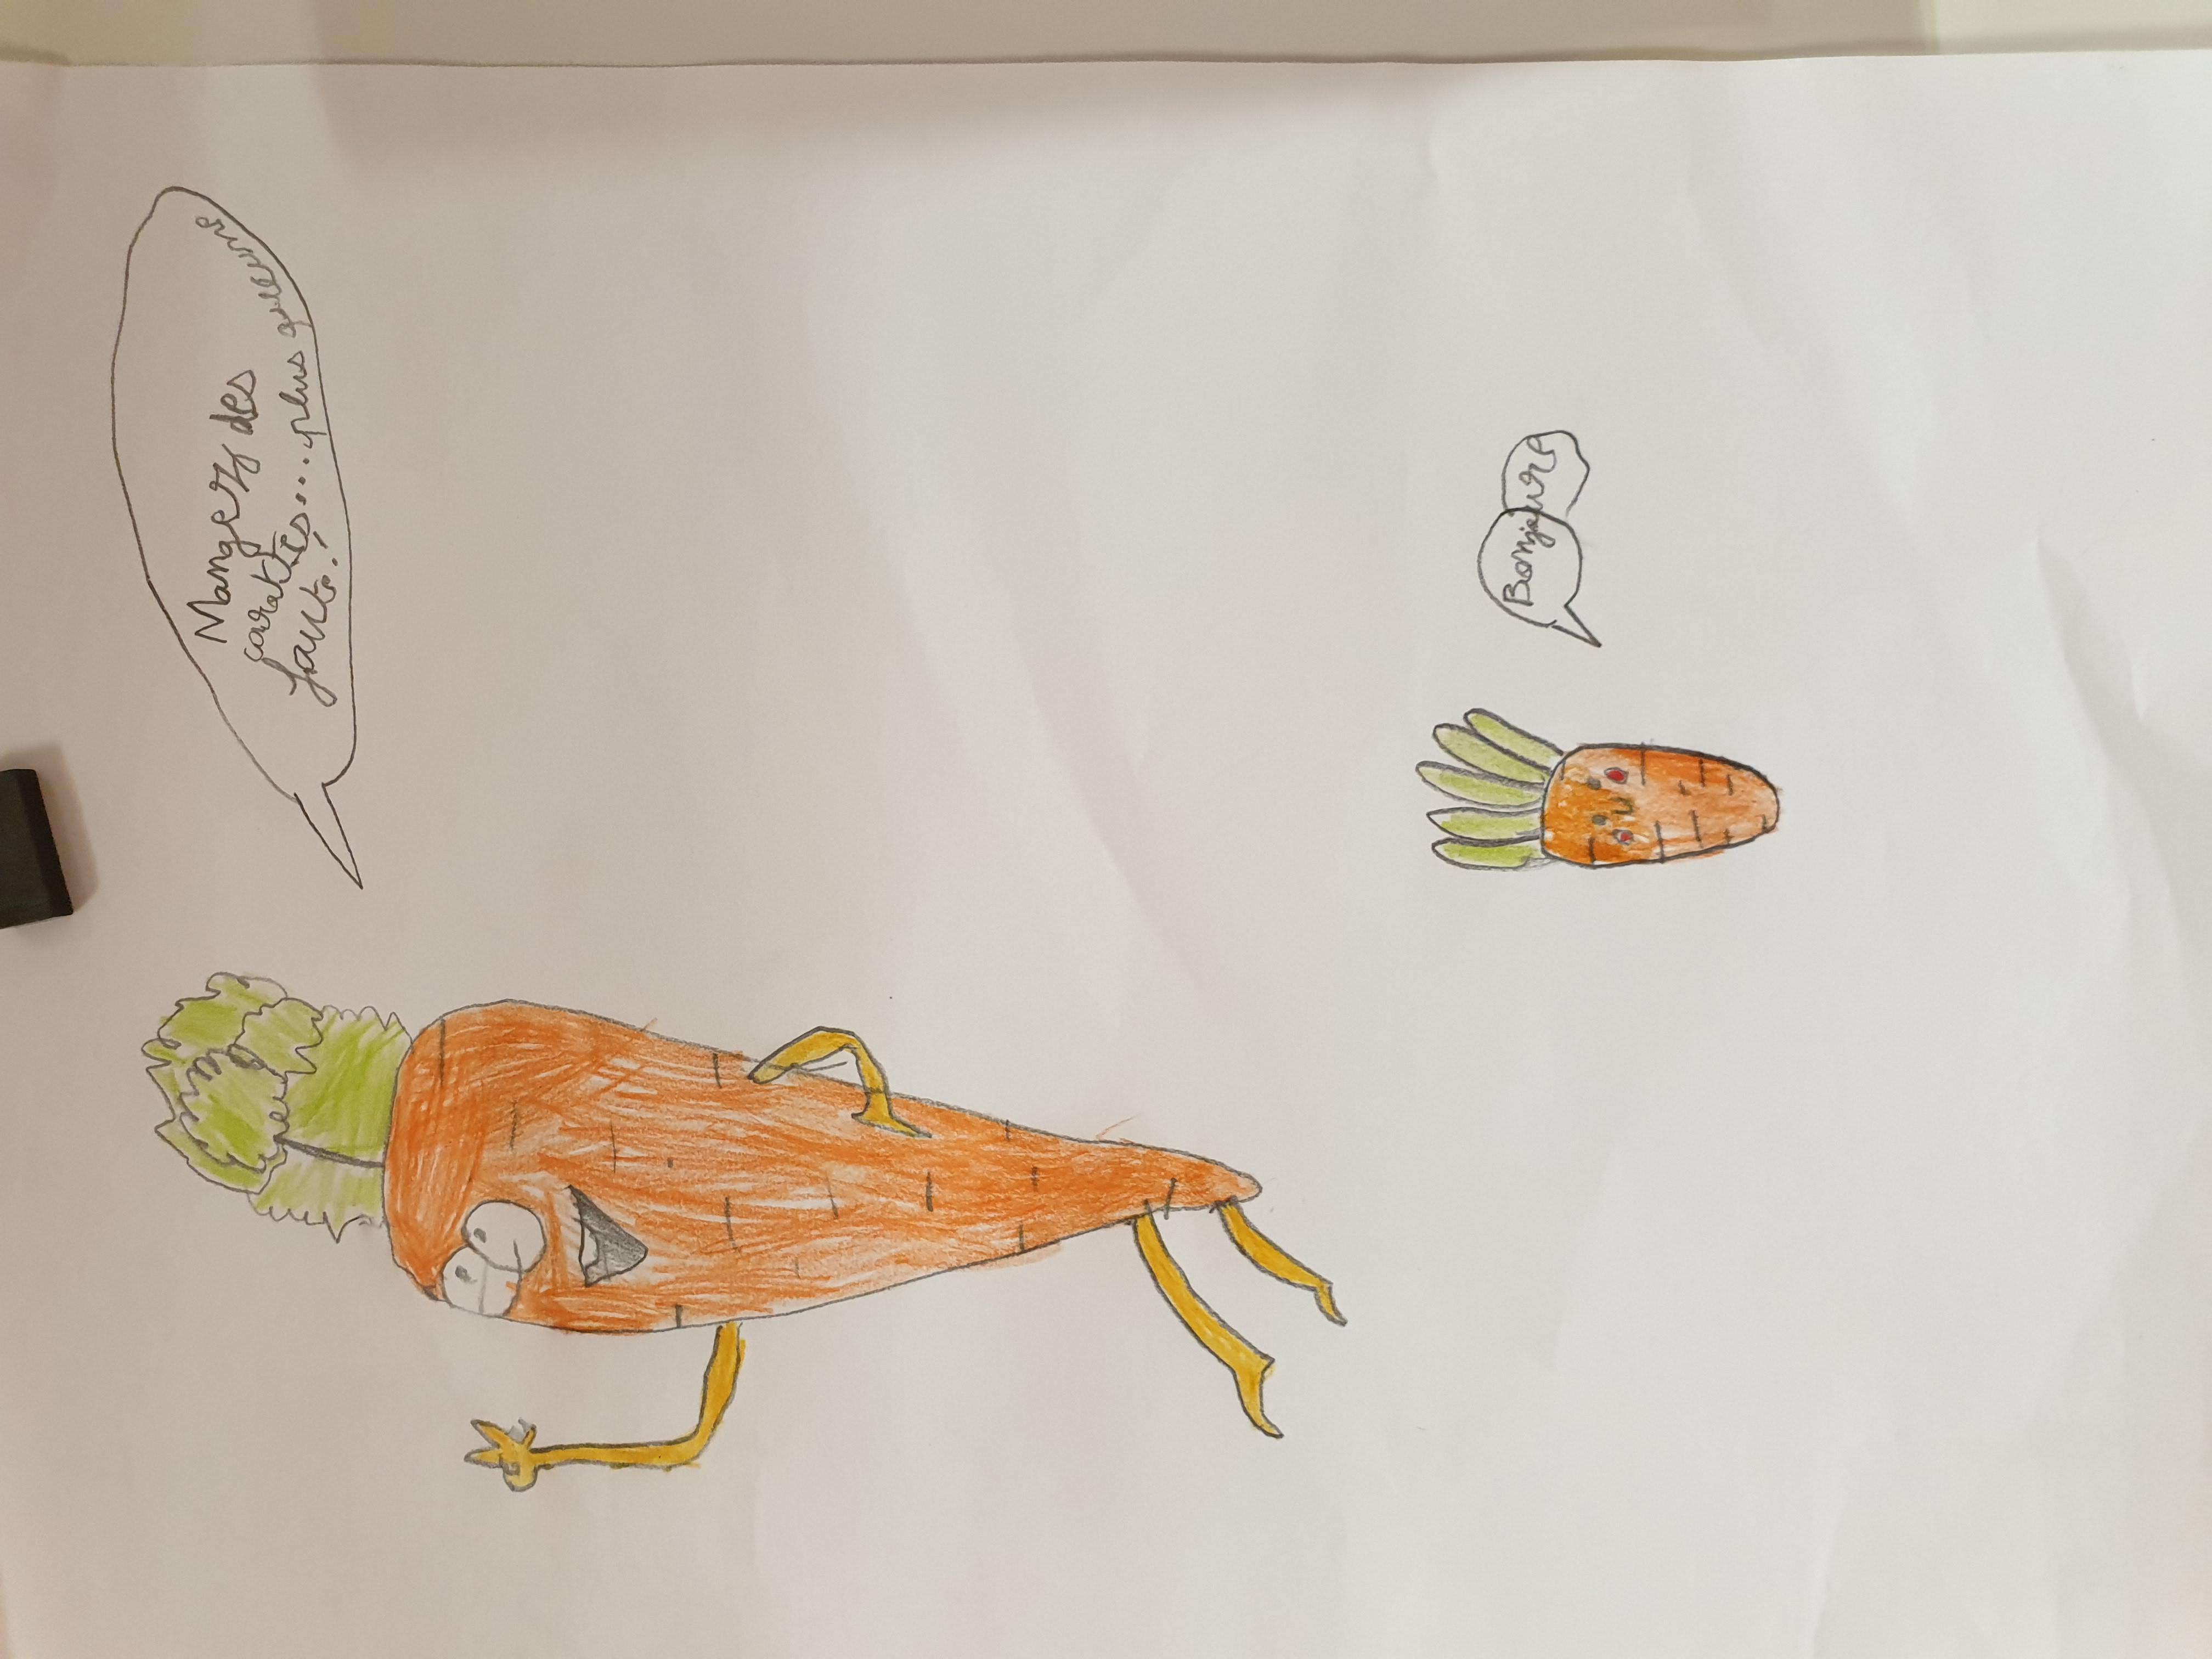 LGA - Enfance et jeunesse - label eco ecole  dessin enfant.jpg